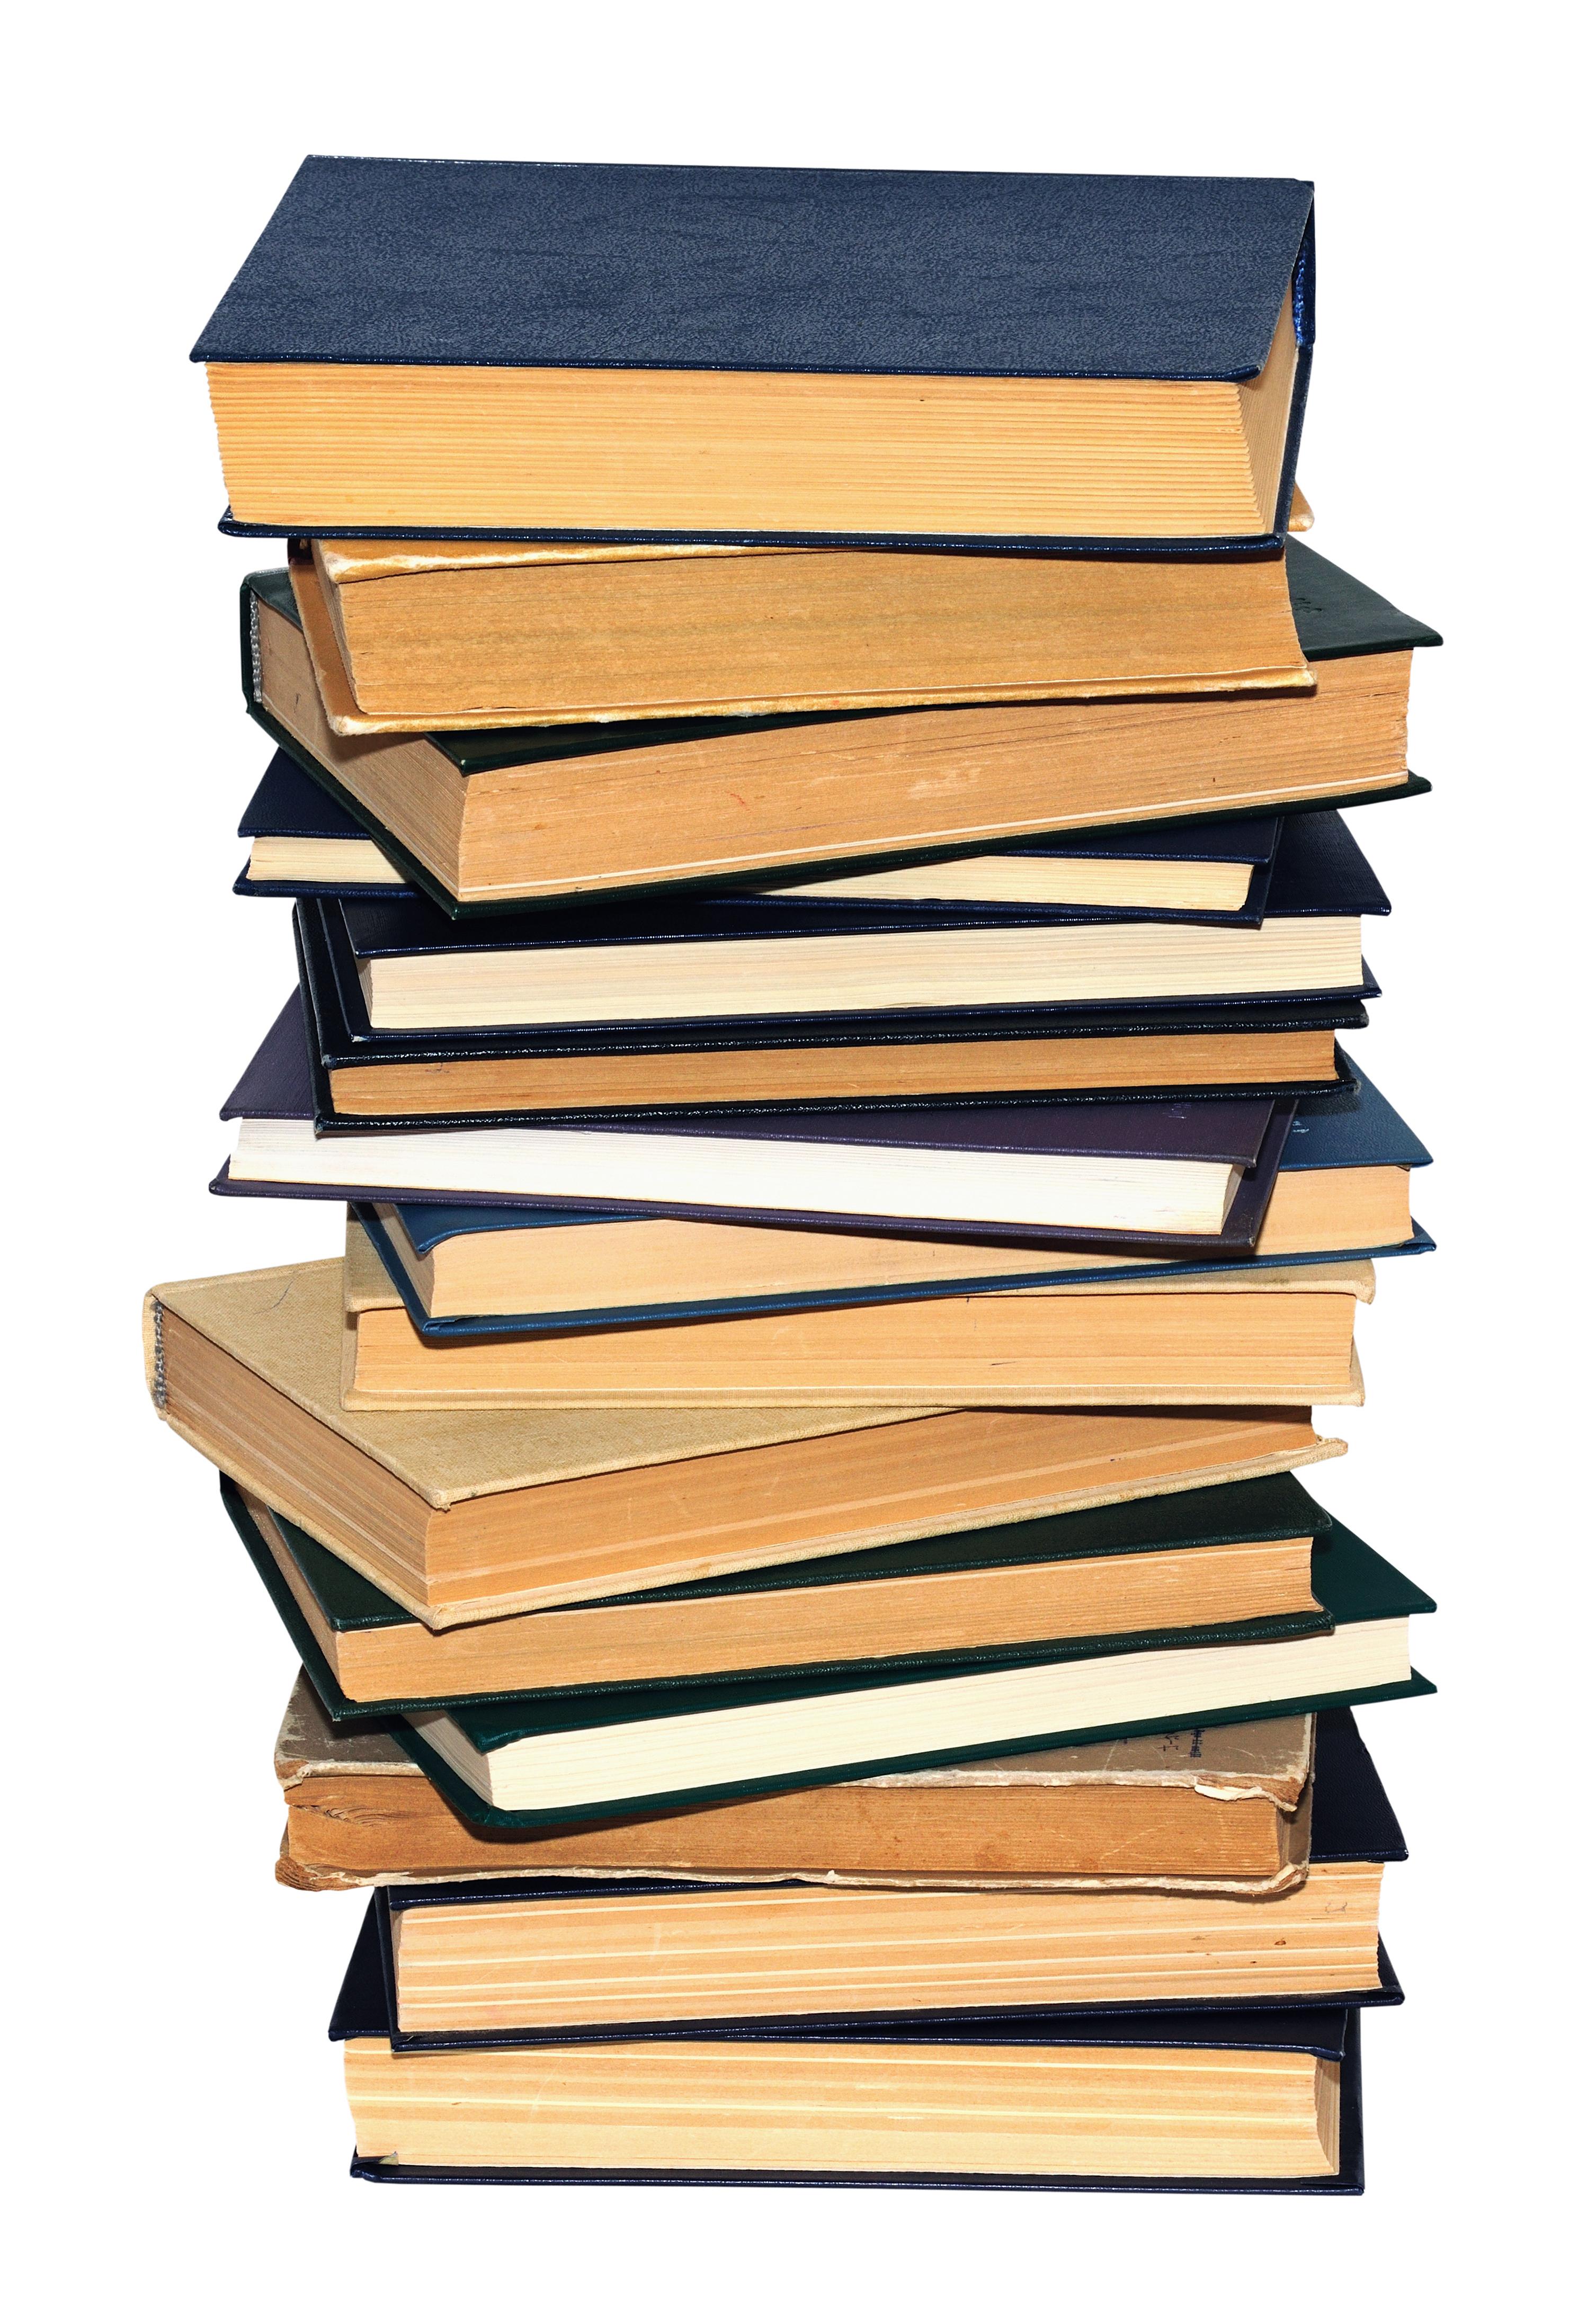 pile books stack clipart education student clip sports alaska clipartix mexico whether fans writing same kid oaxaca indigenous triqui graduates